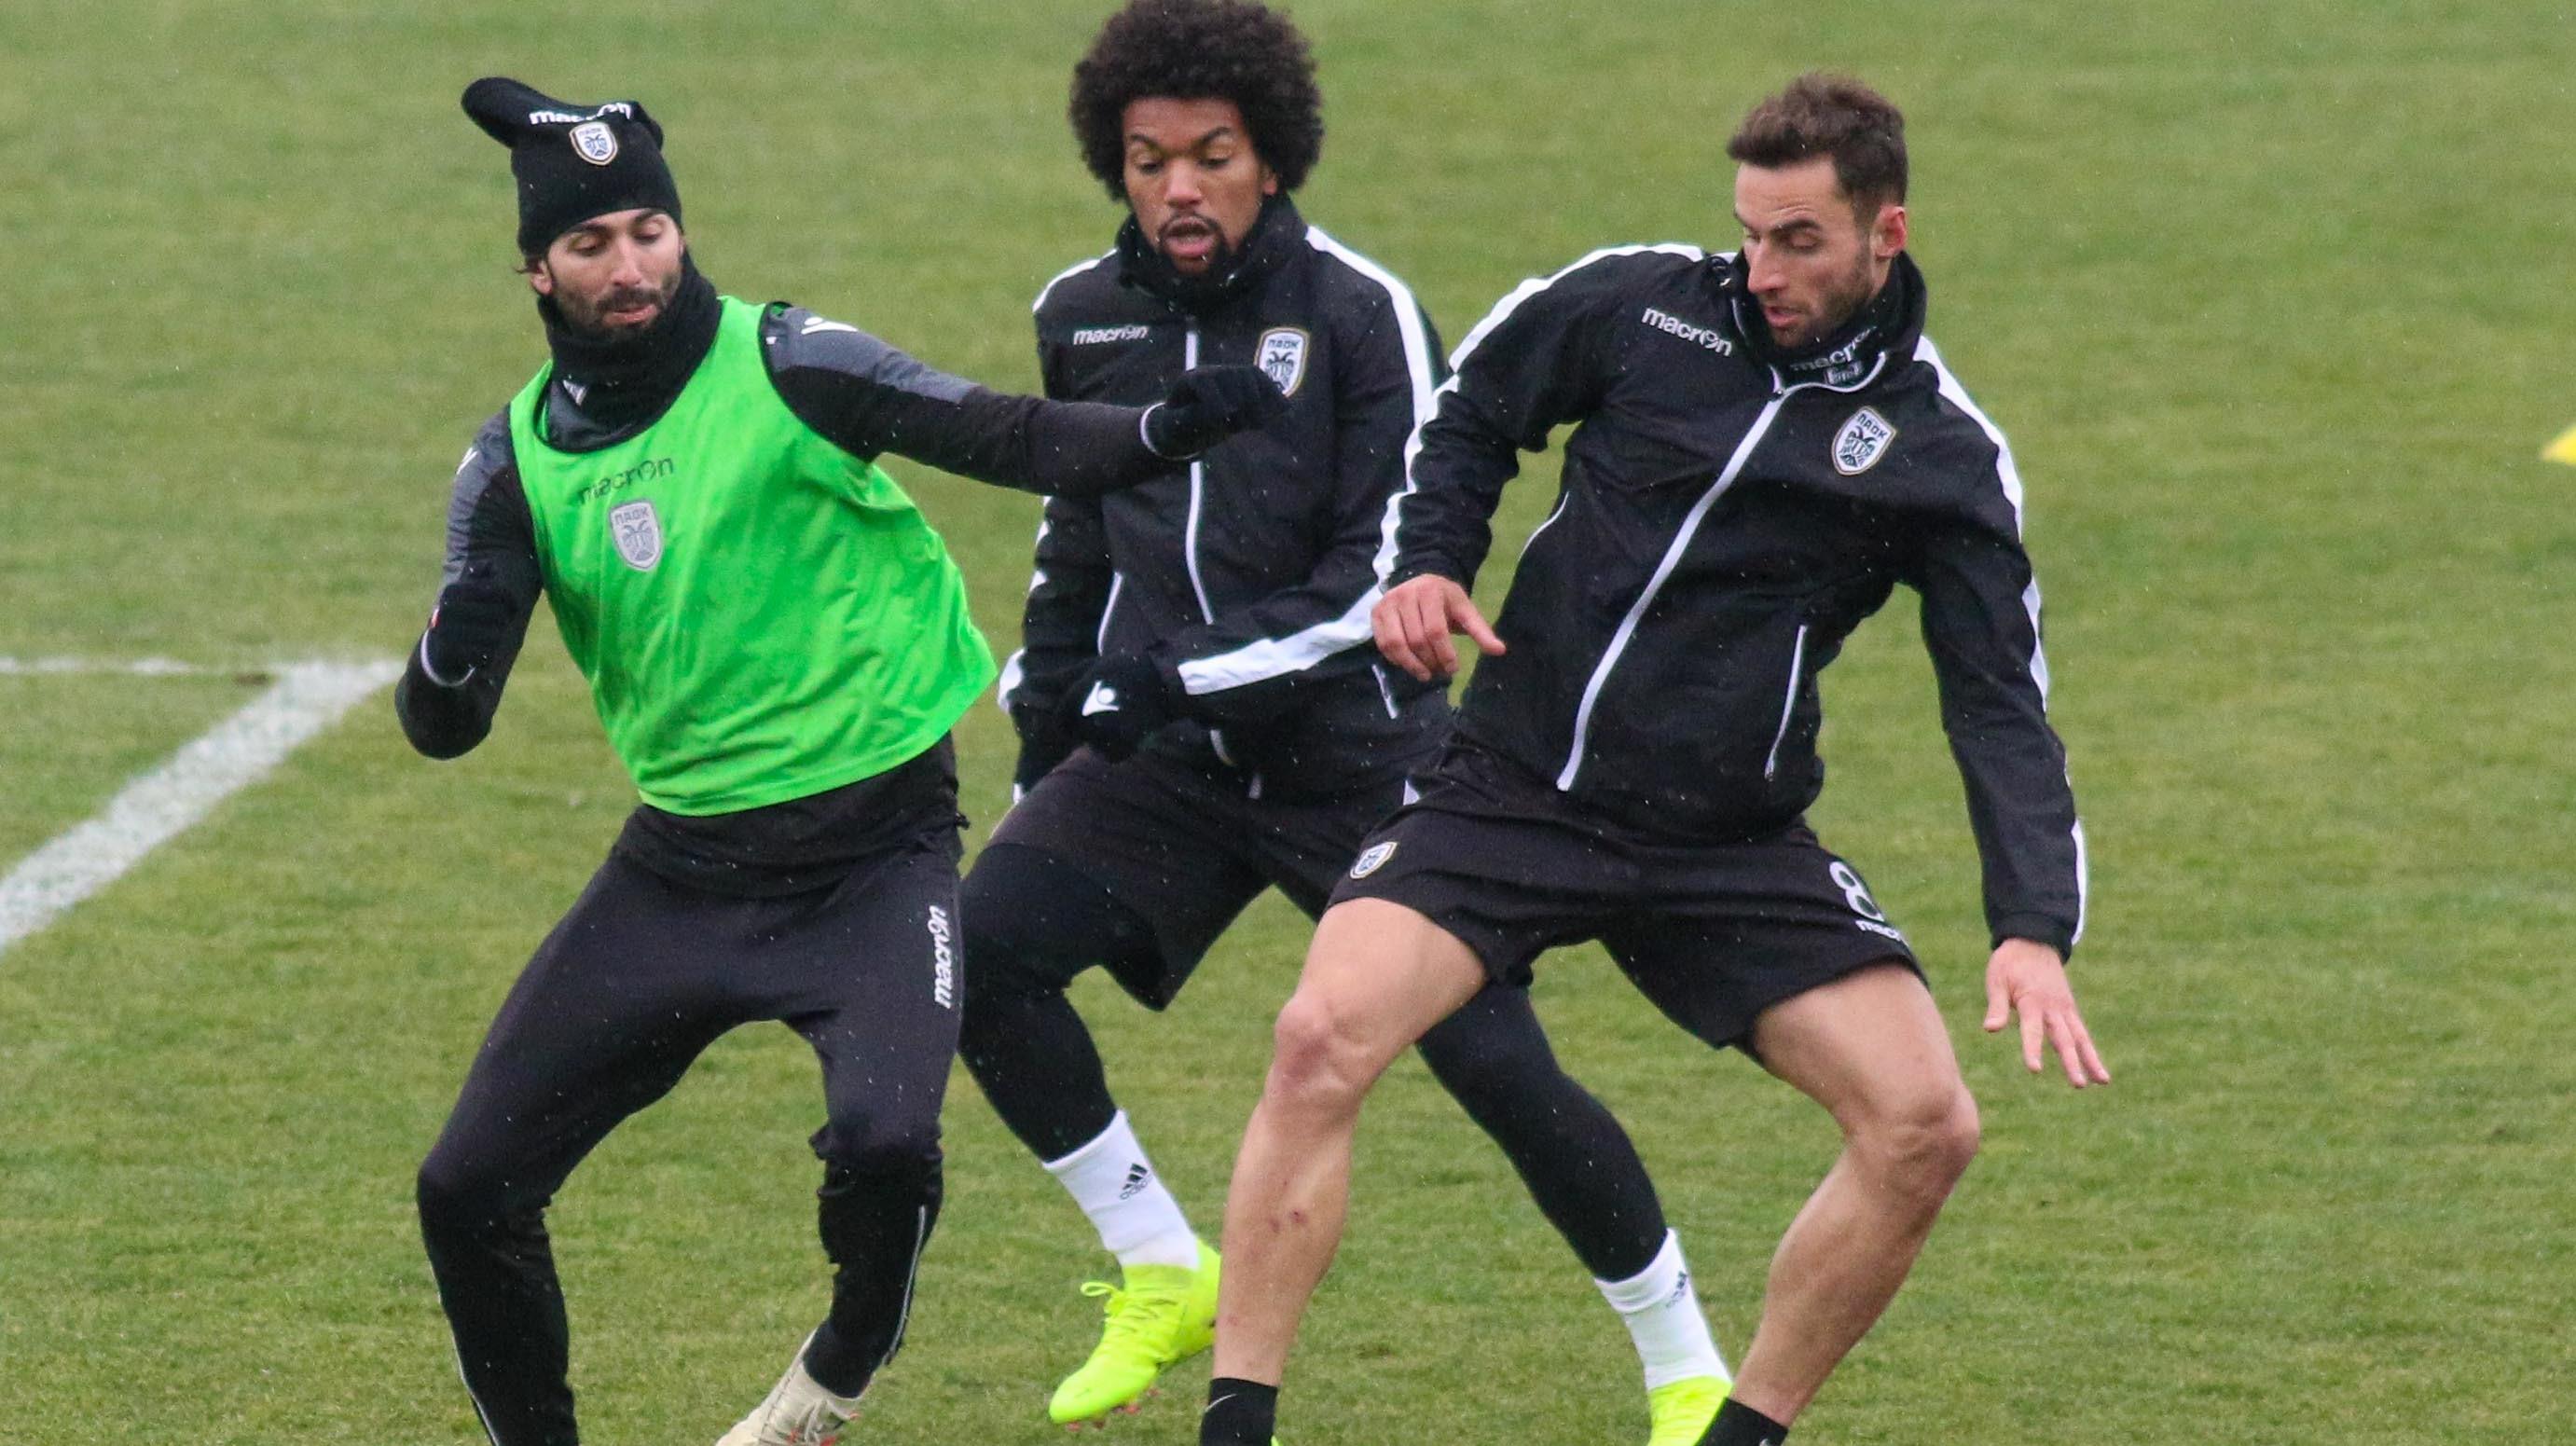 Training match highlights